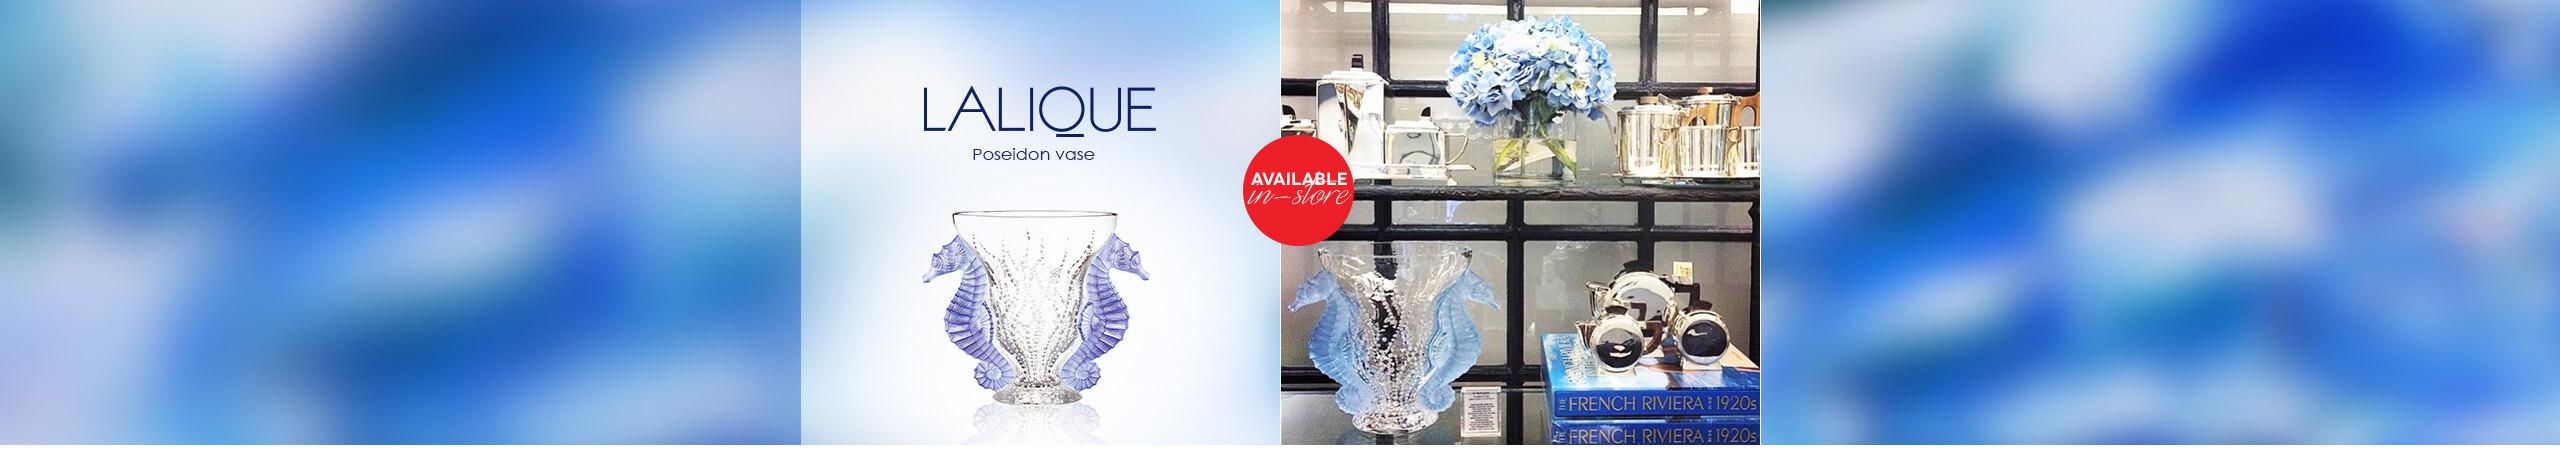 Lalique Poseidon Vase